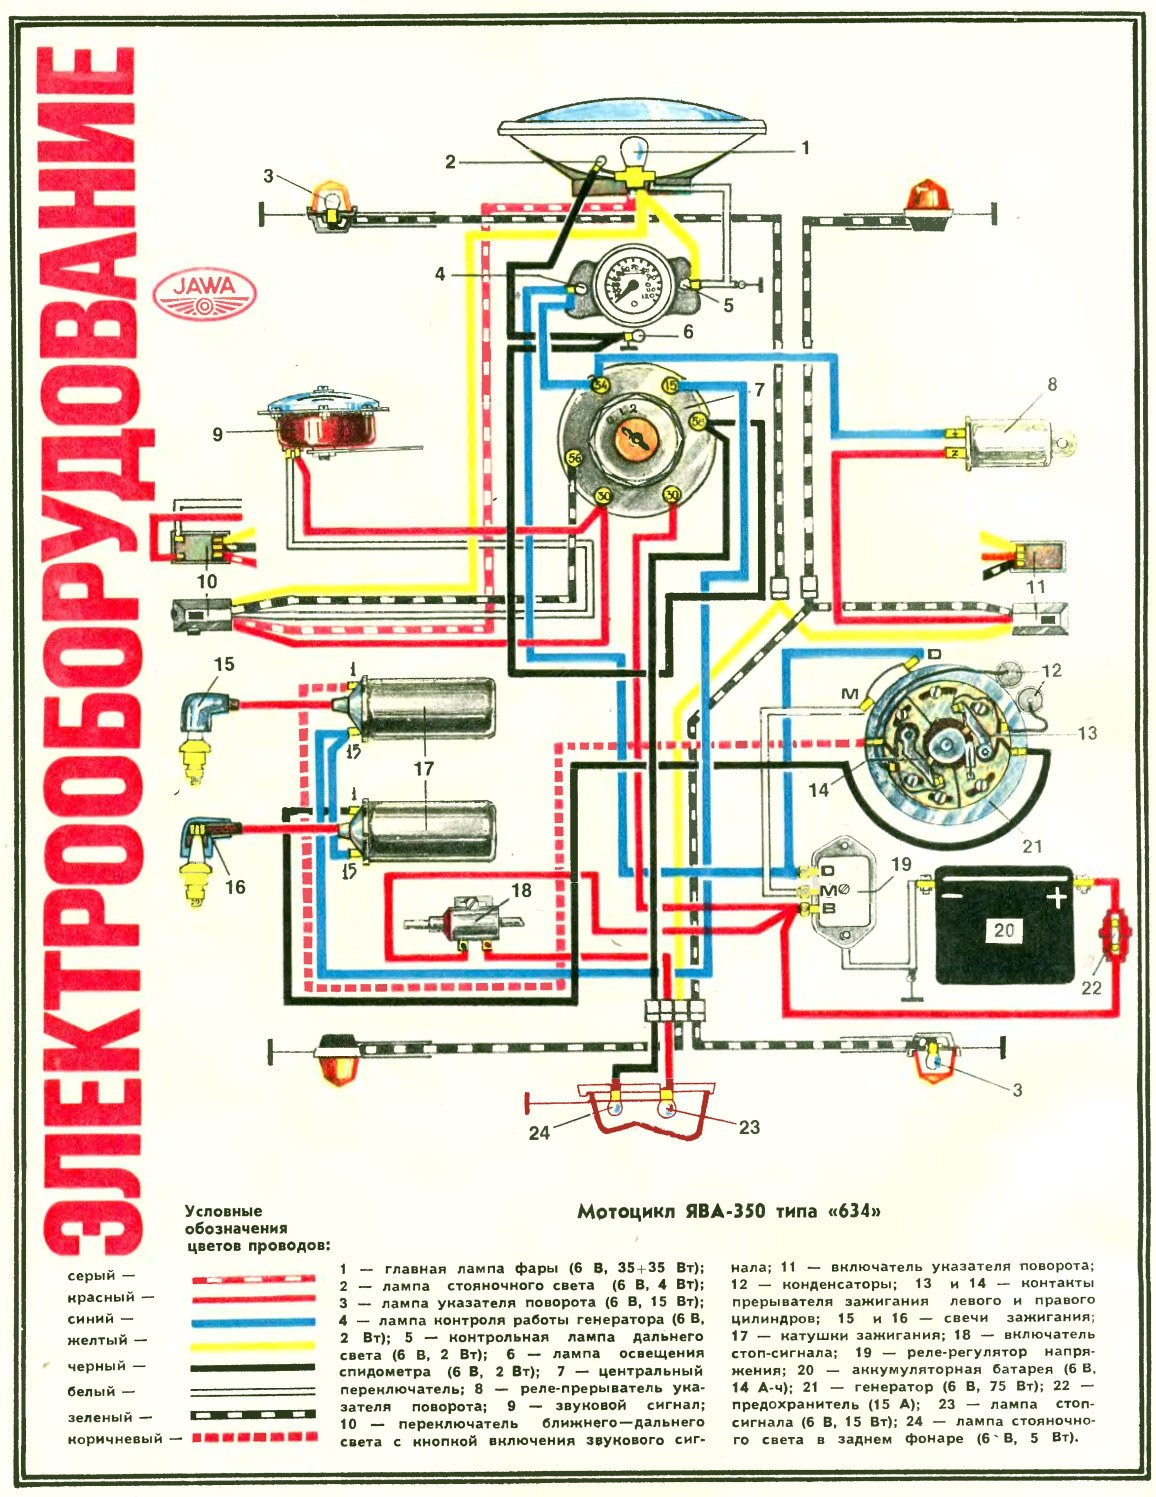 Схема проводки ява 640